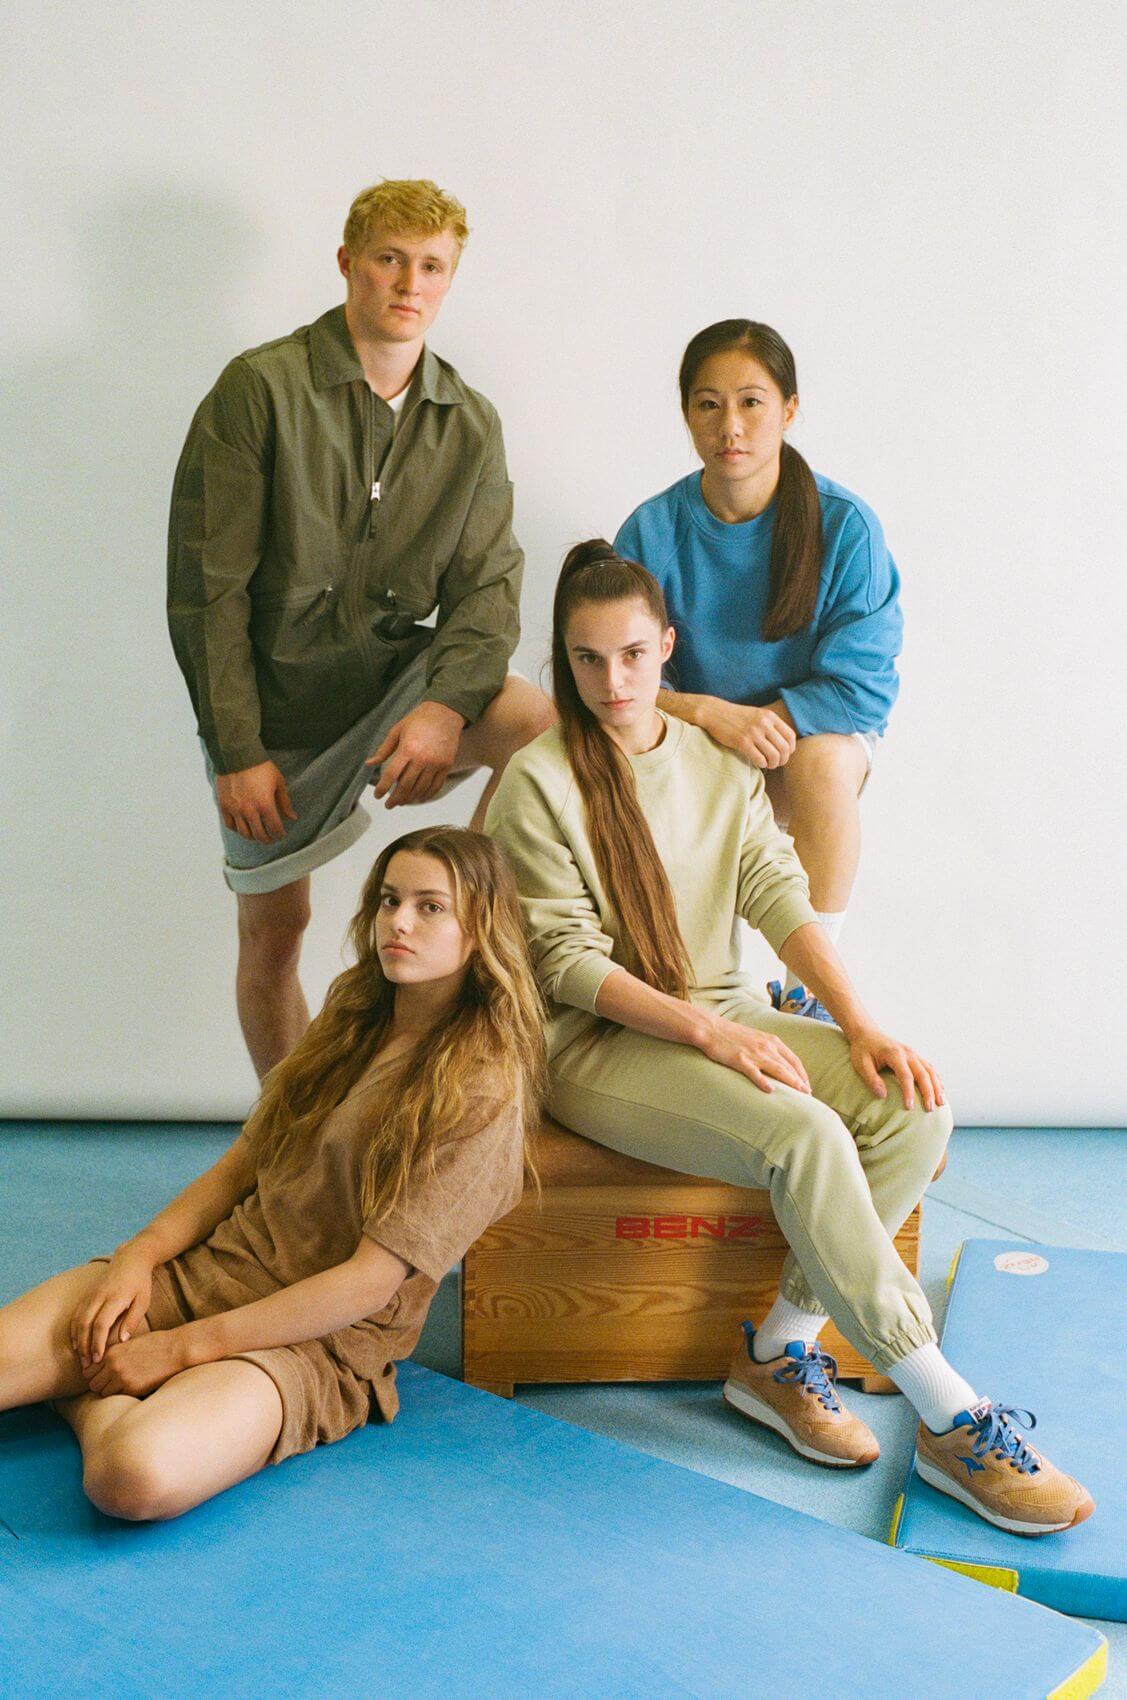 sneaker collab - KangaROOS x DTB(Deutscher Turner-Bund) - The DTB - brown/blue